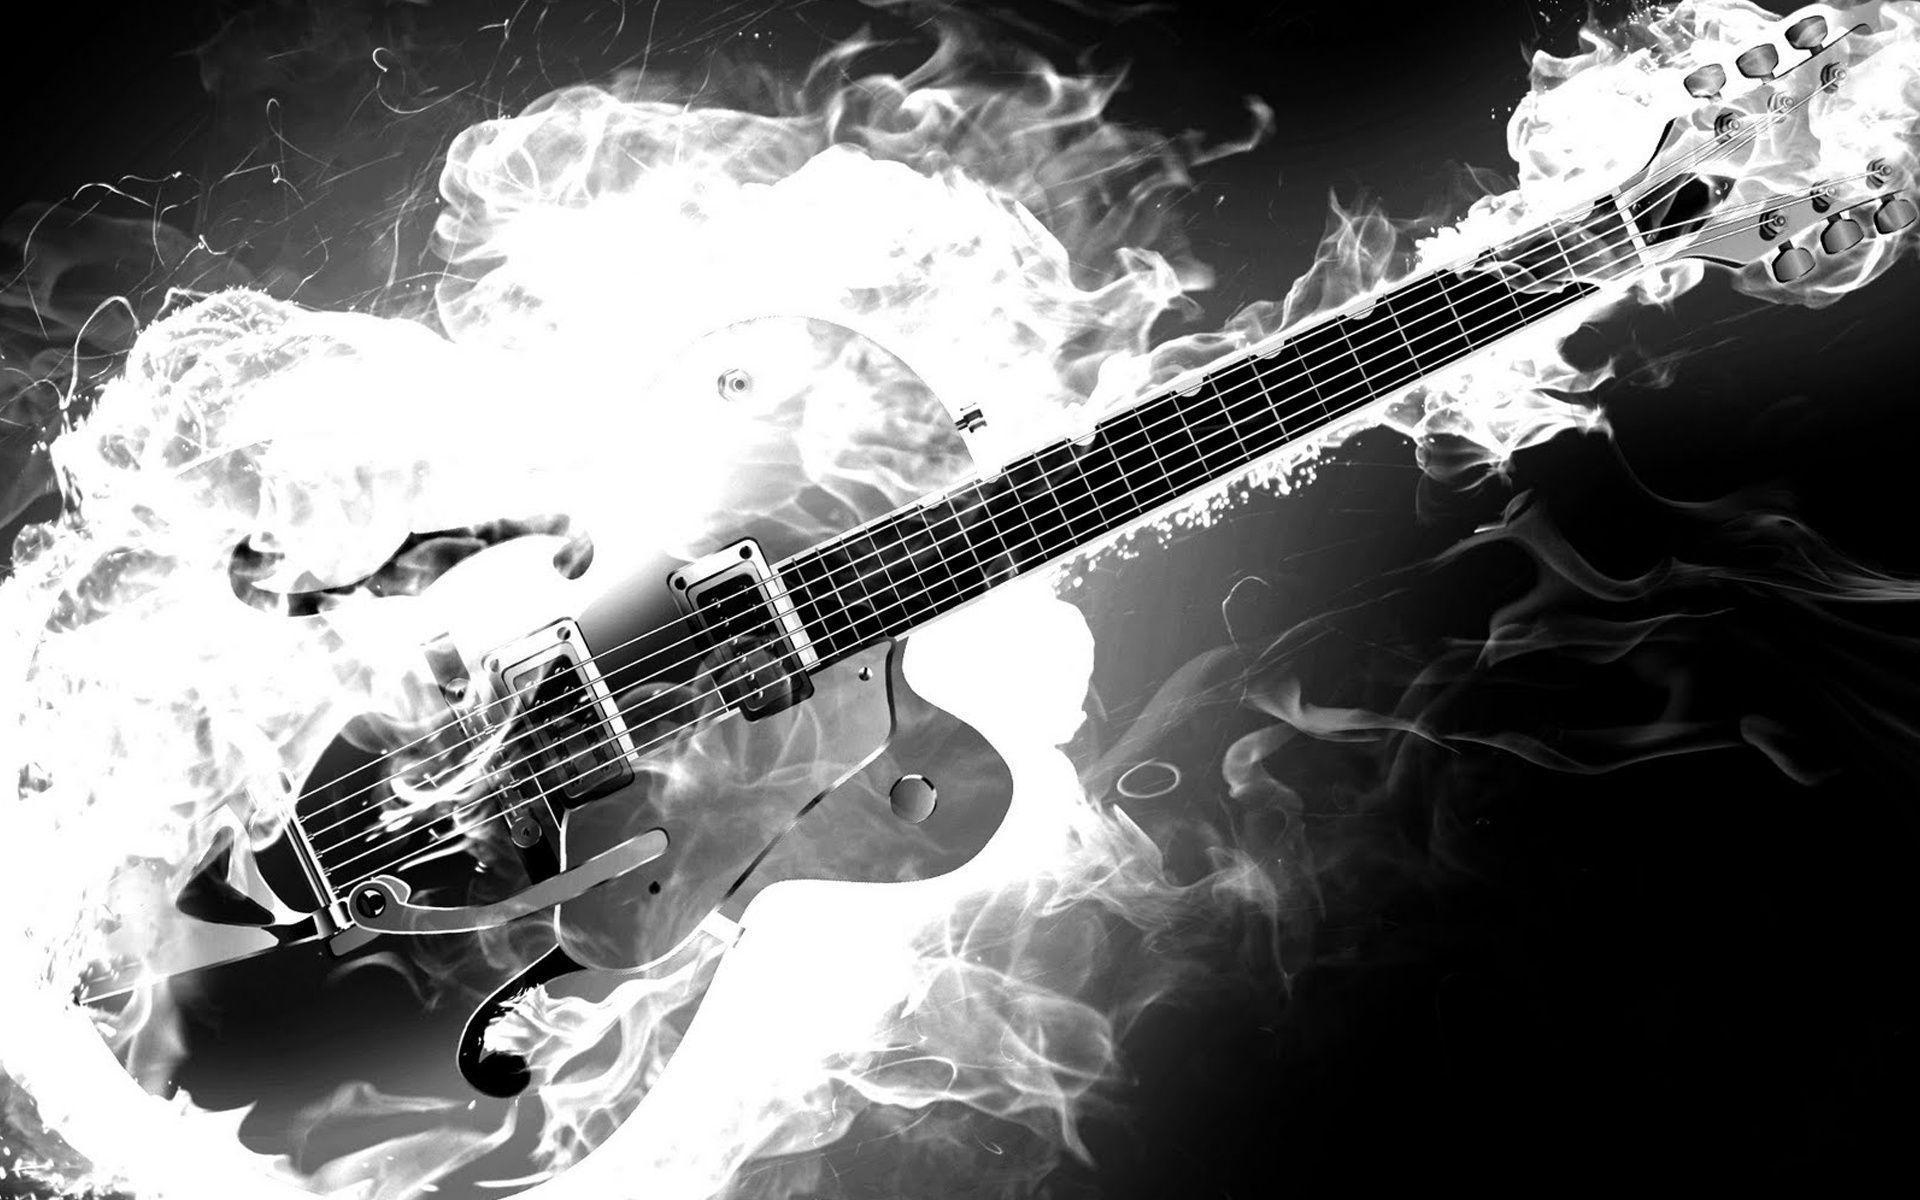 Awesome guitar wallpapers wallpaper cave - Cool guitar wallpaper ...